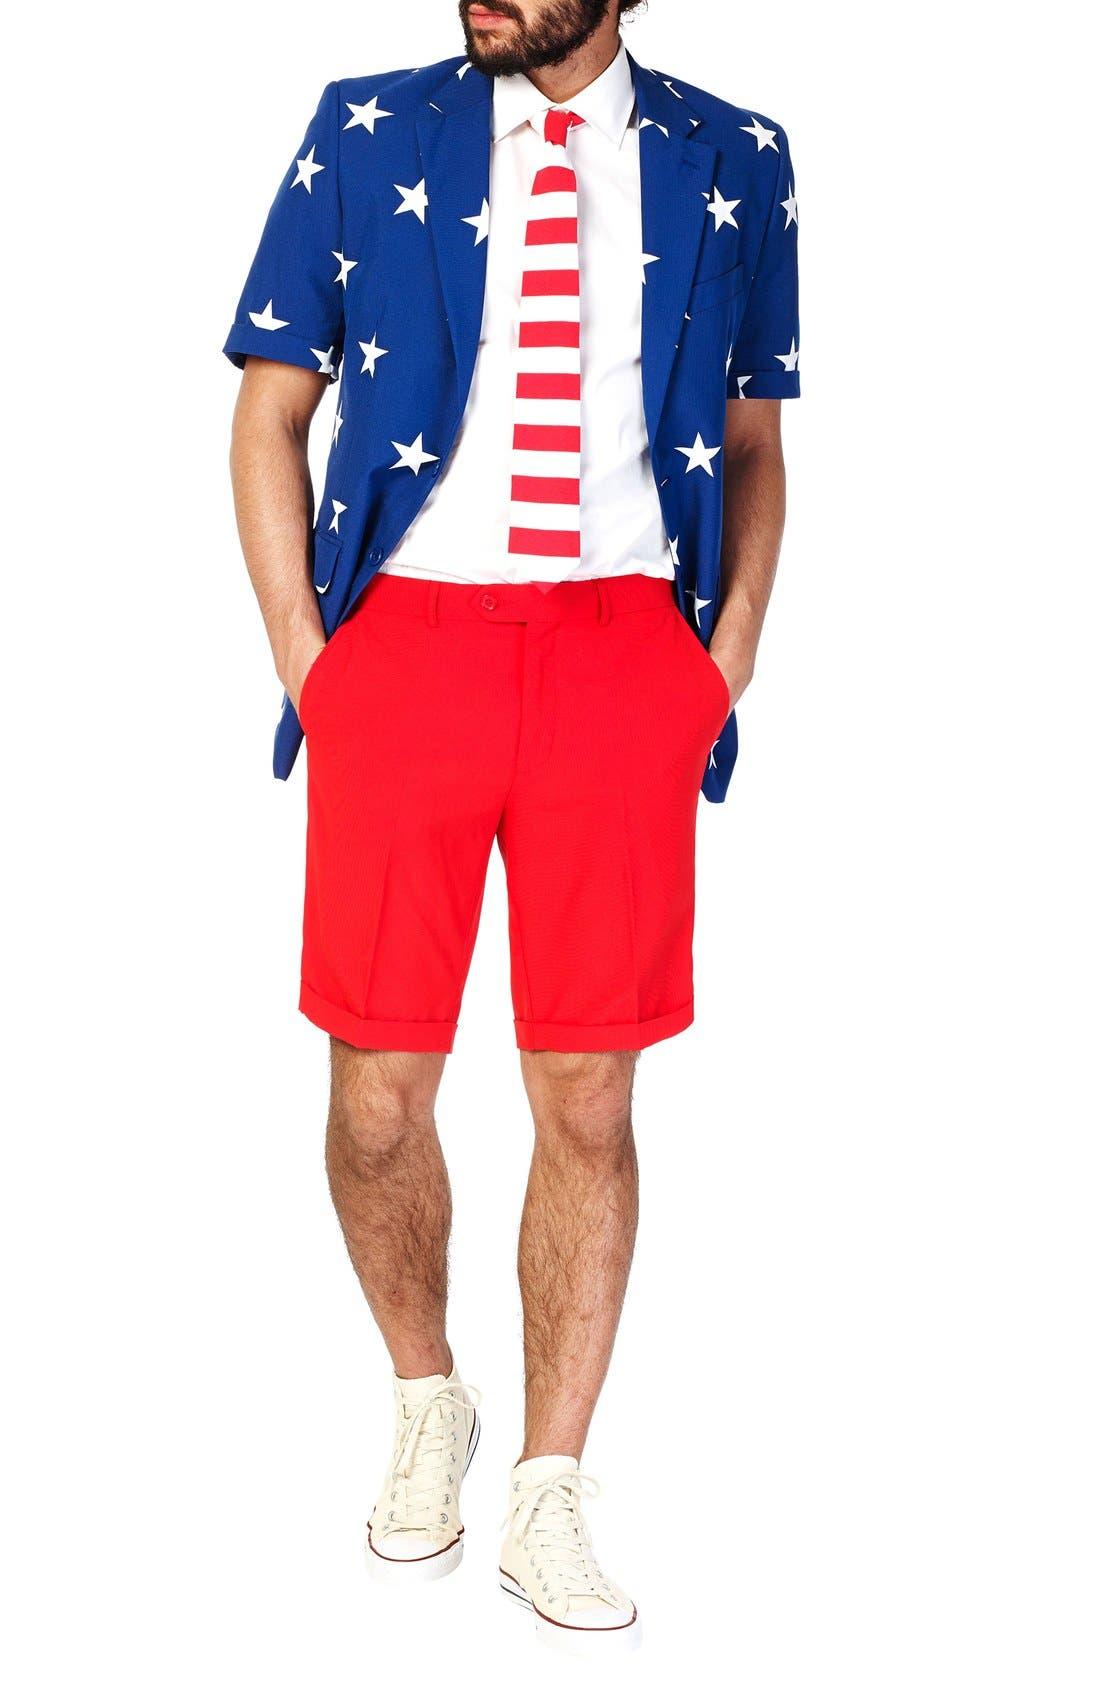 'Summer Stars & Stripes' Trim Fit Short Suit with Tie,                         Main,                         color, 400